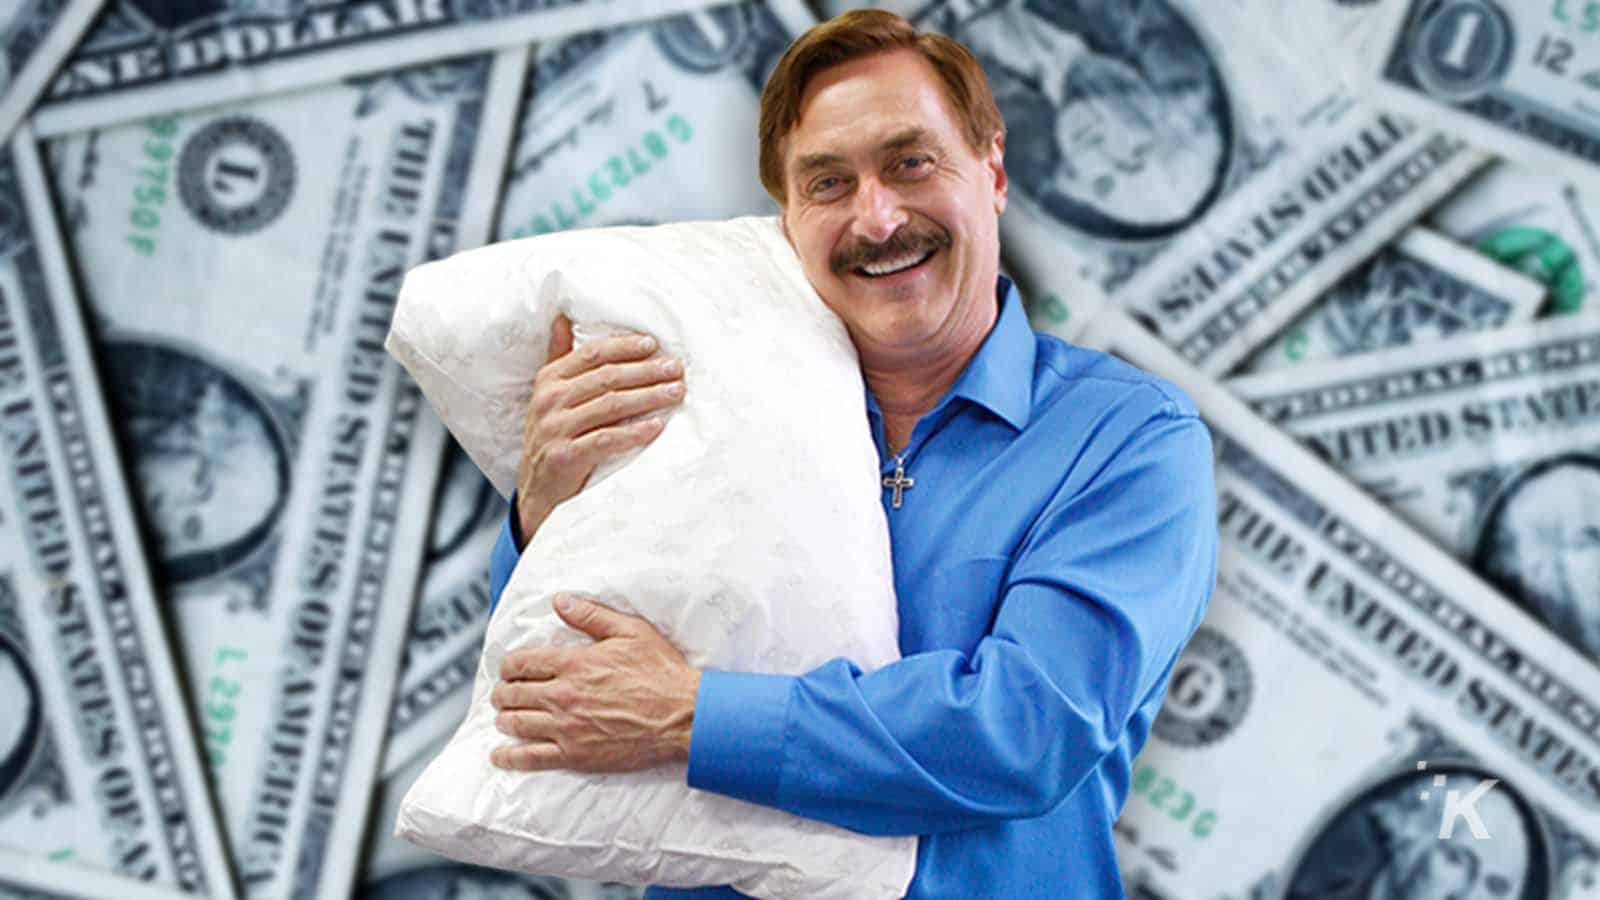 mypillow guy with money